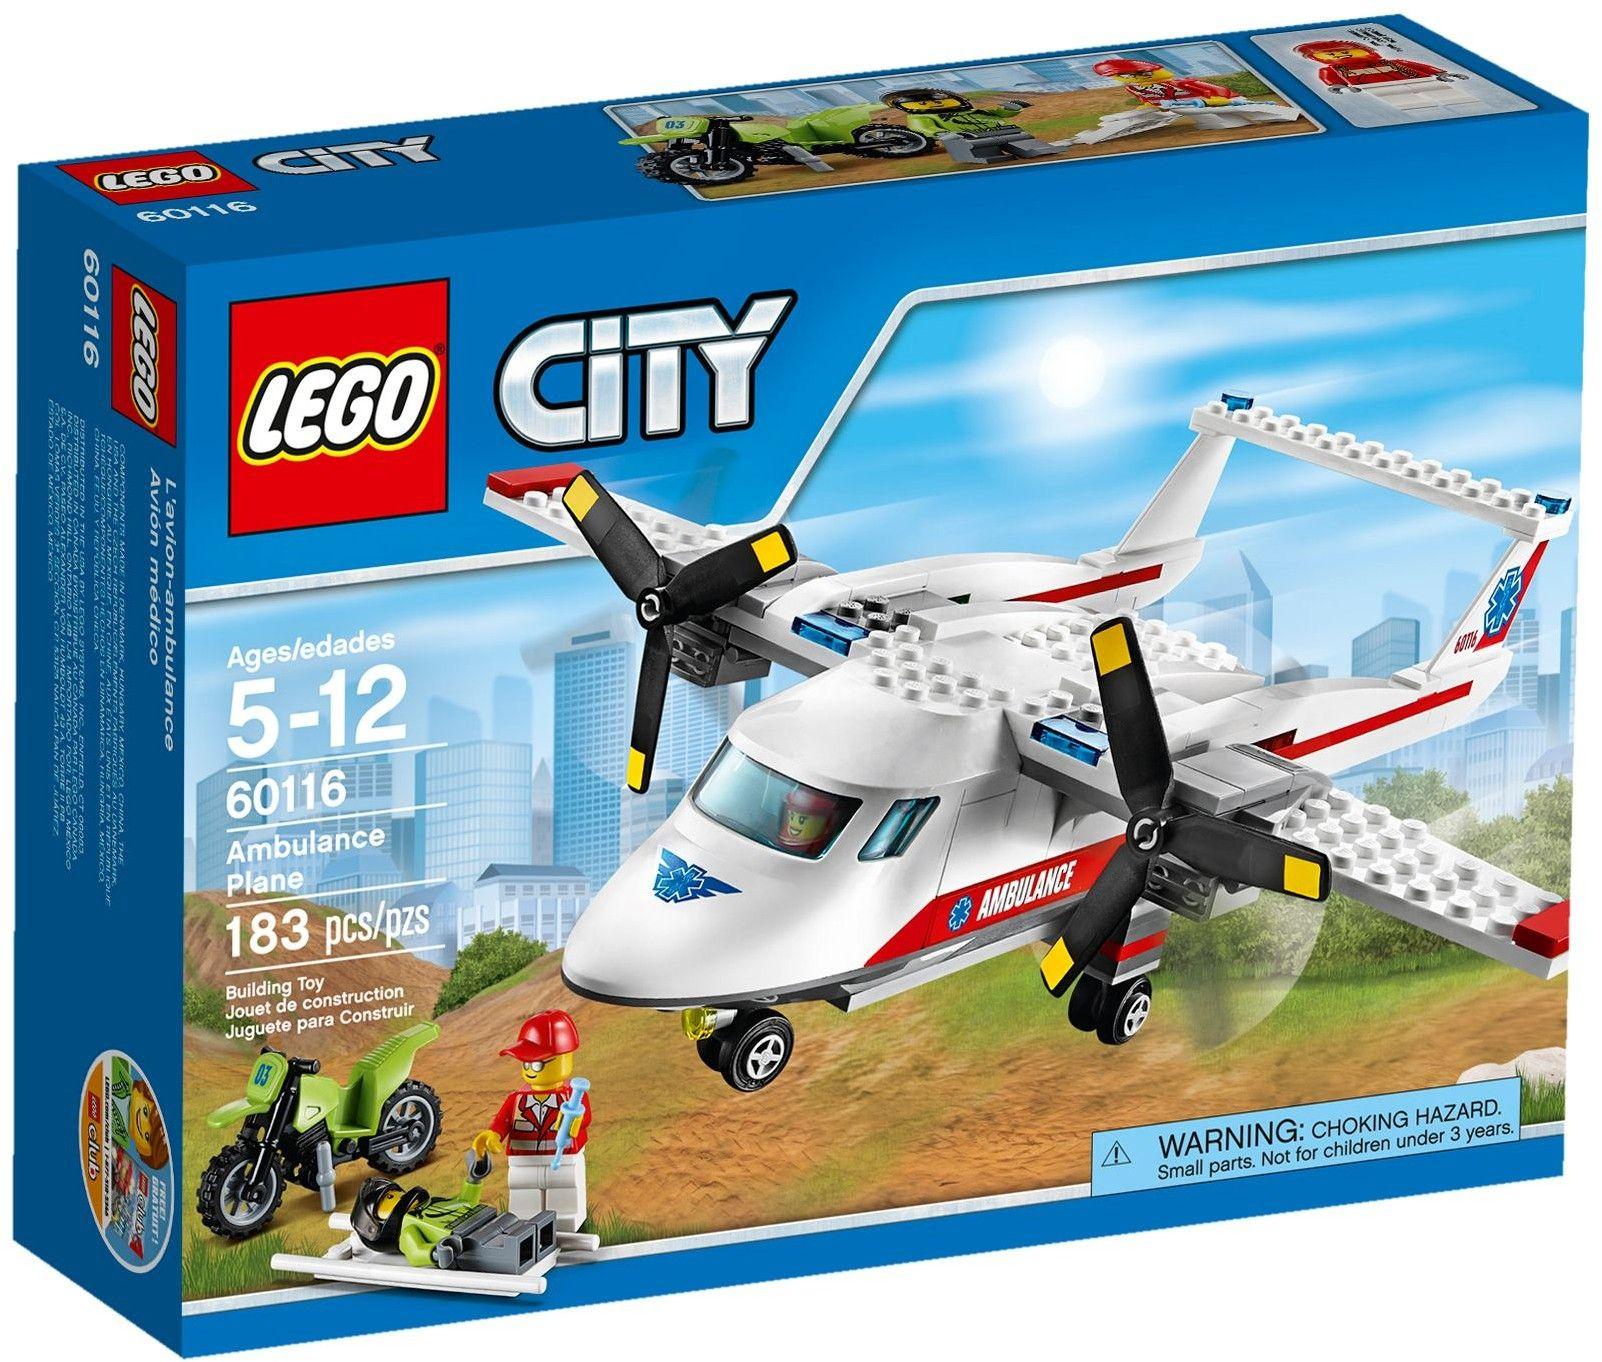 Lego City 60116 L'Avion De Secours | Lego City, Lego City dedans Lego Avion De Ligne